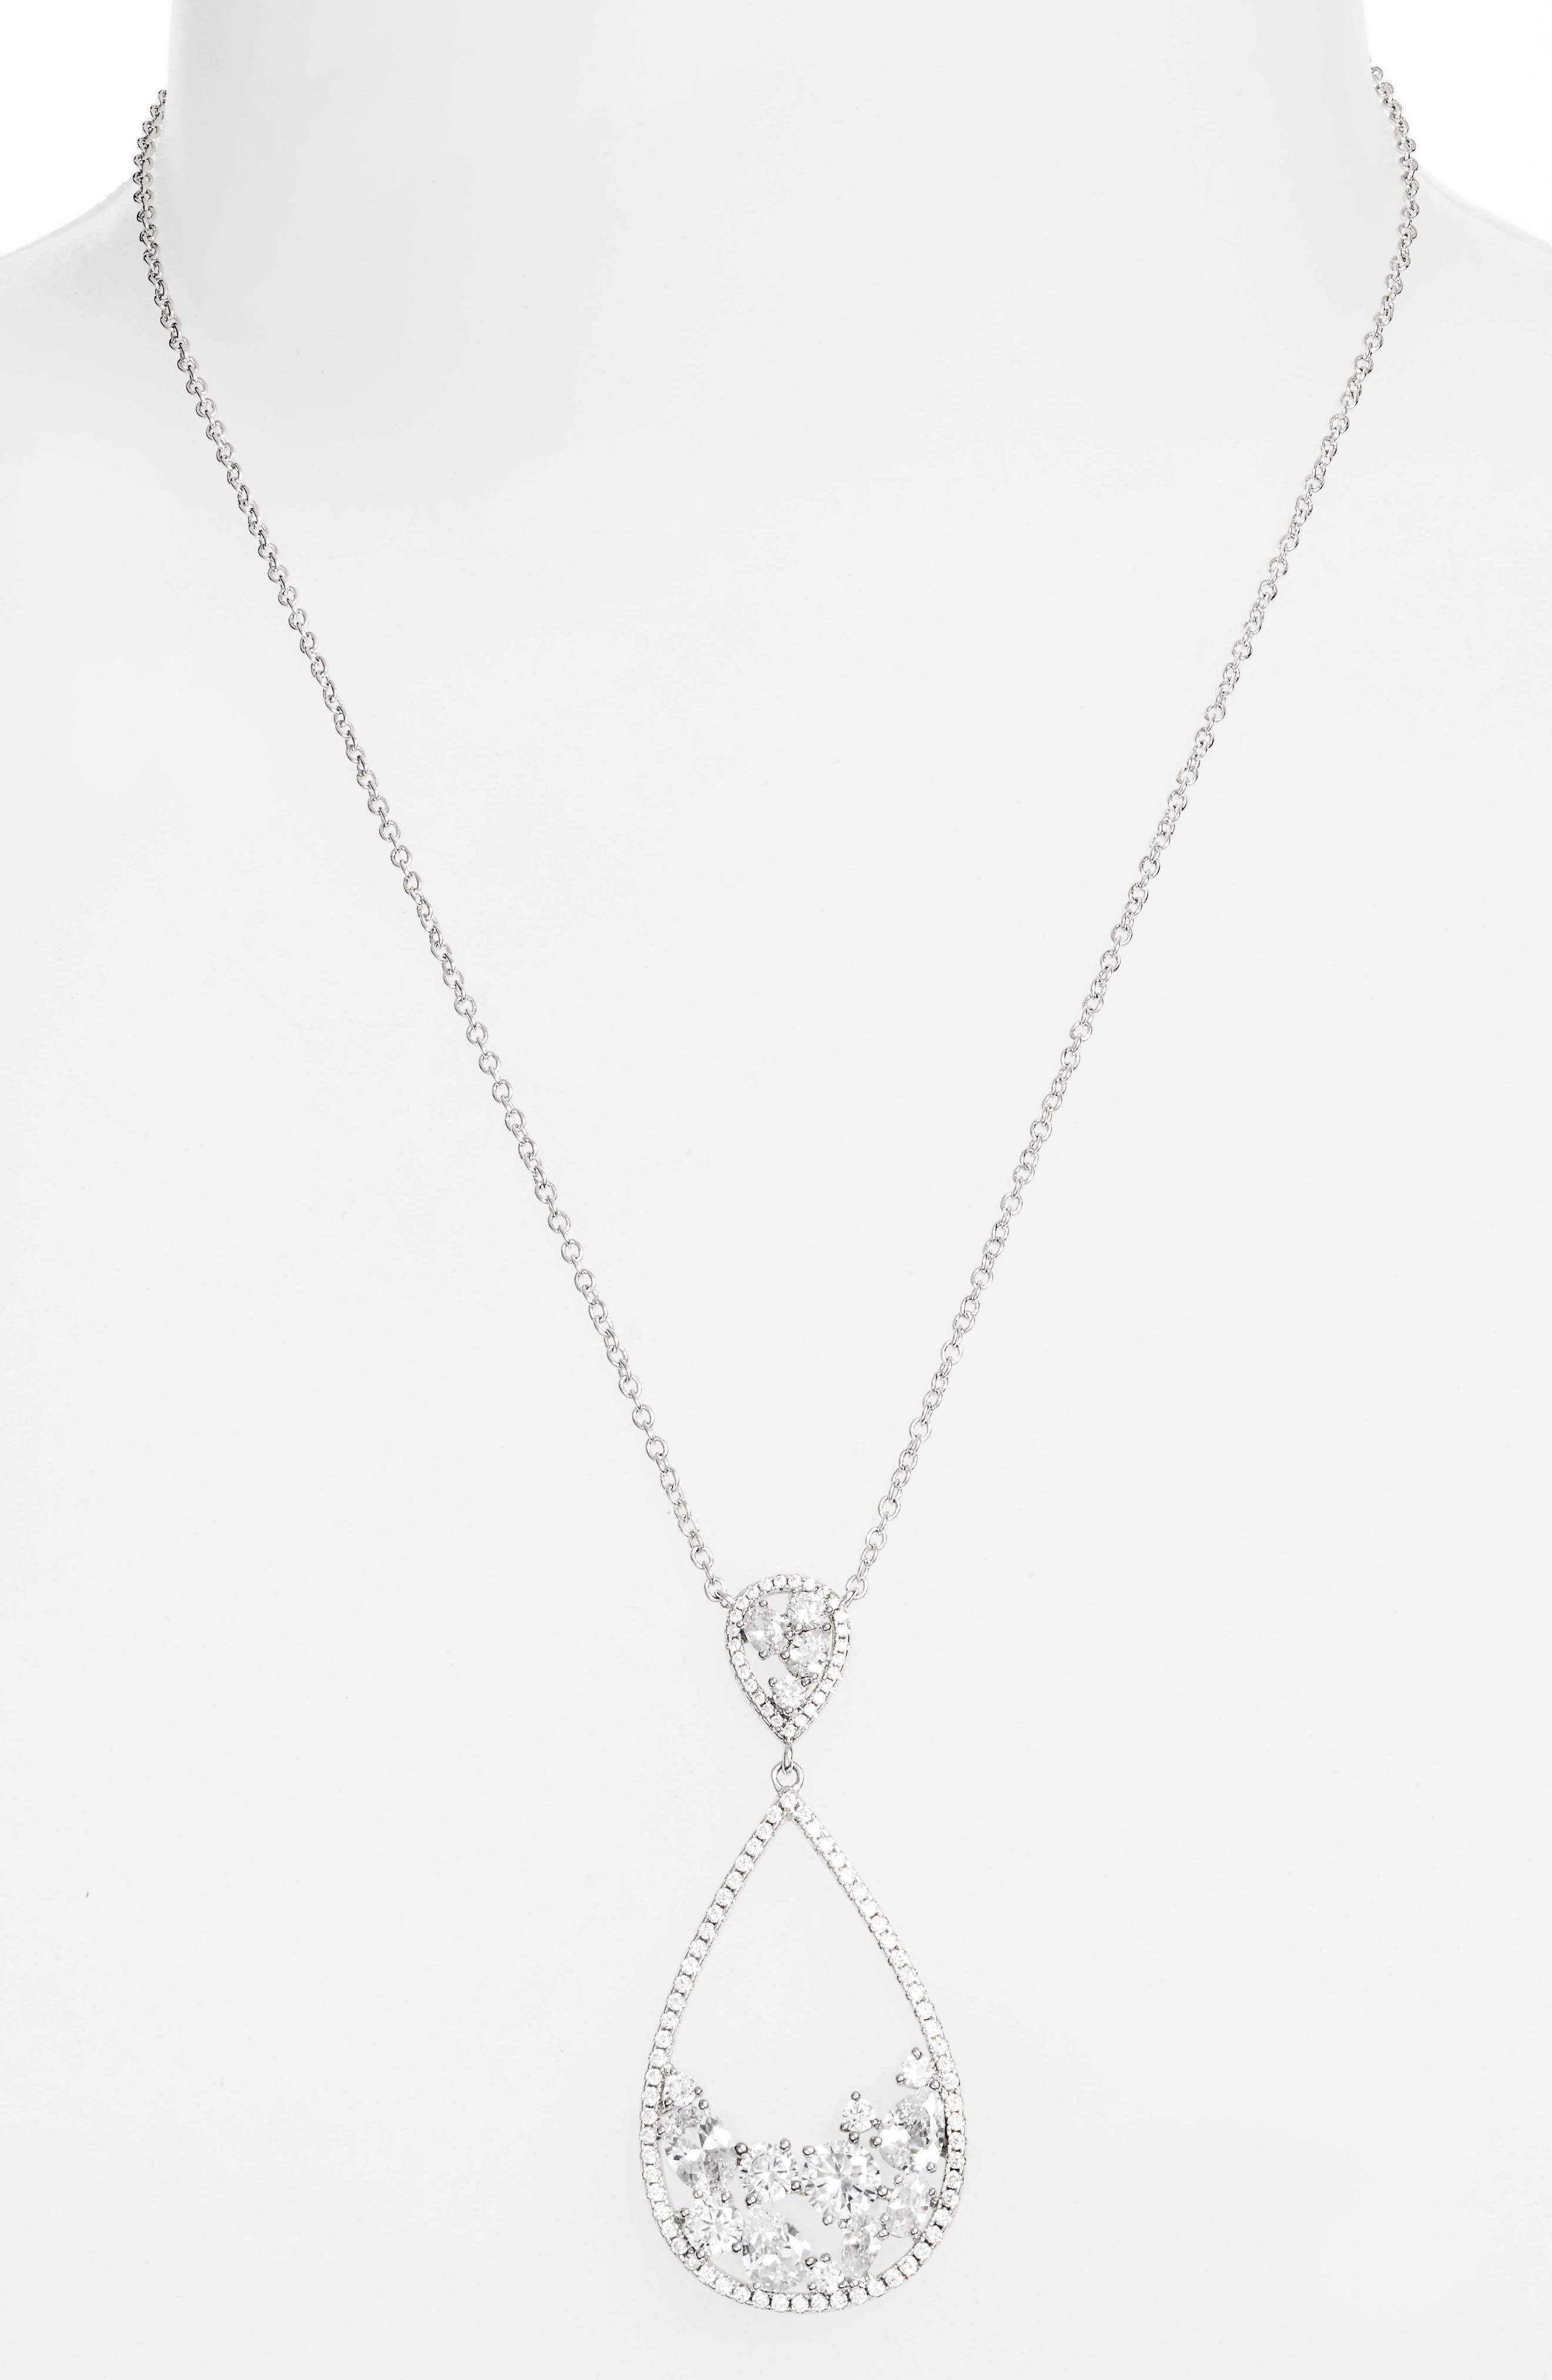 Stone Cluster Open Teardrop Pendant Necklace,                             Alternate thumbnail 2, color,                             SILVER/ WHITE CZ